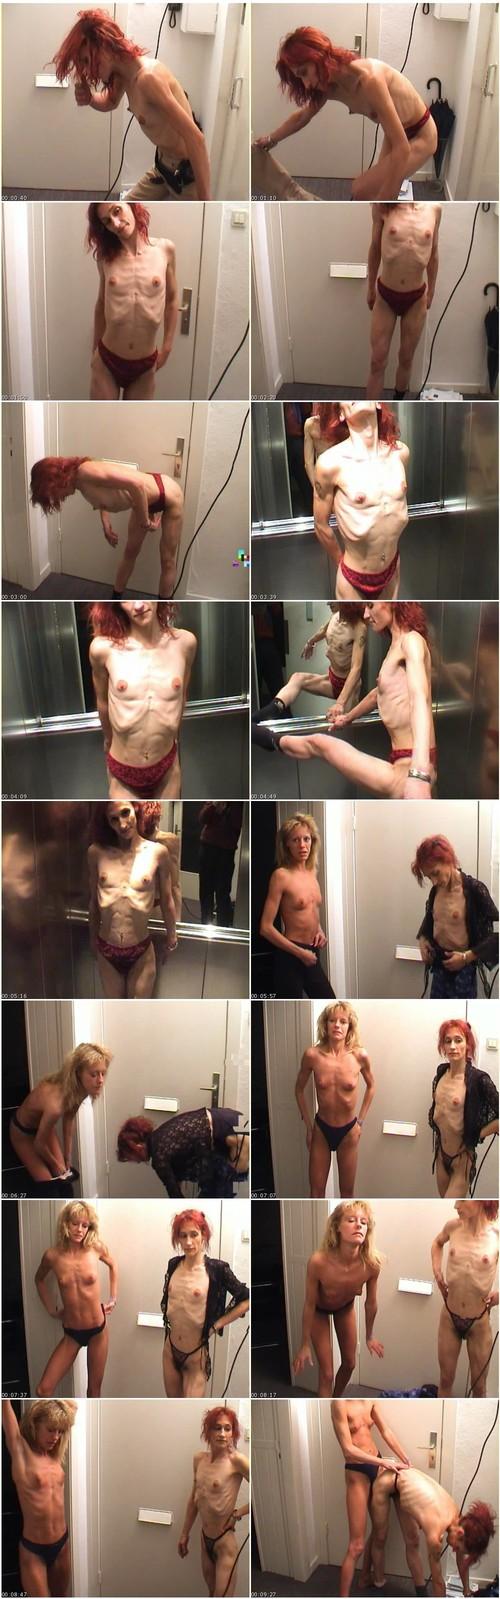 http://ist5-1.filesor.com/pimpandhost.com/9/6/8/3/96838/6/2/C/H/62CHQ/Anorexia167_thumb_m.jpg